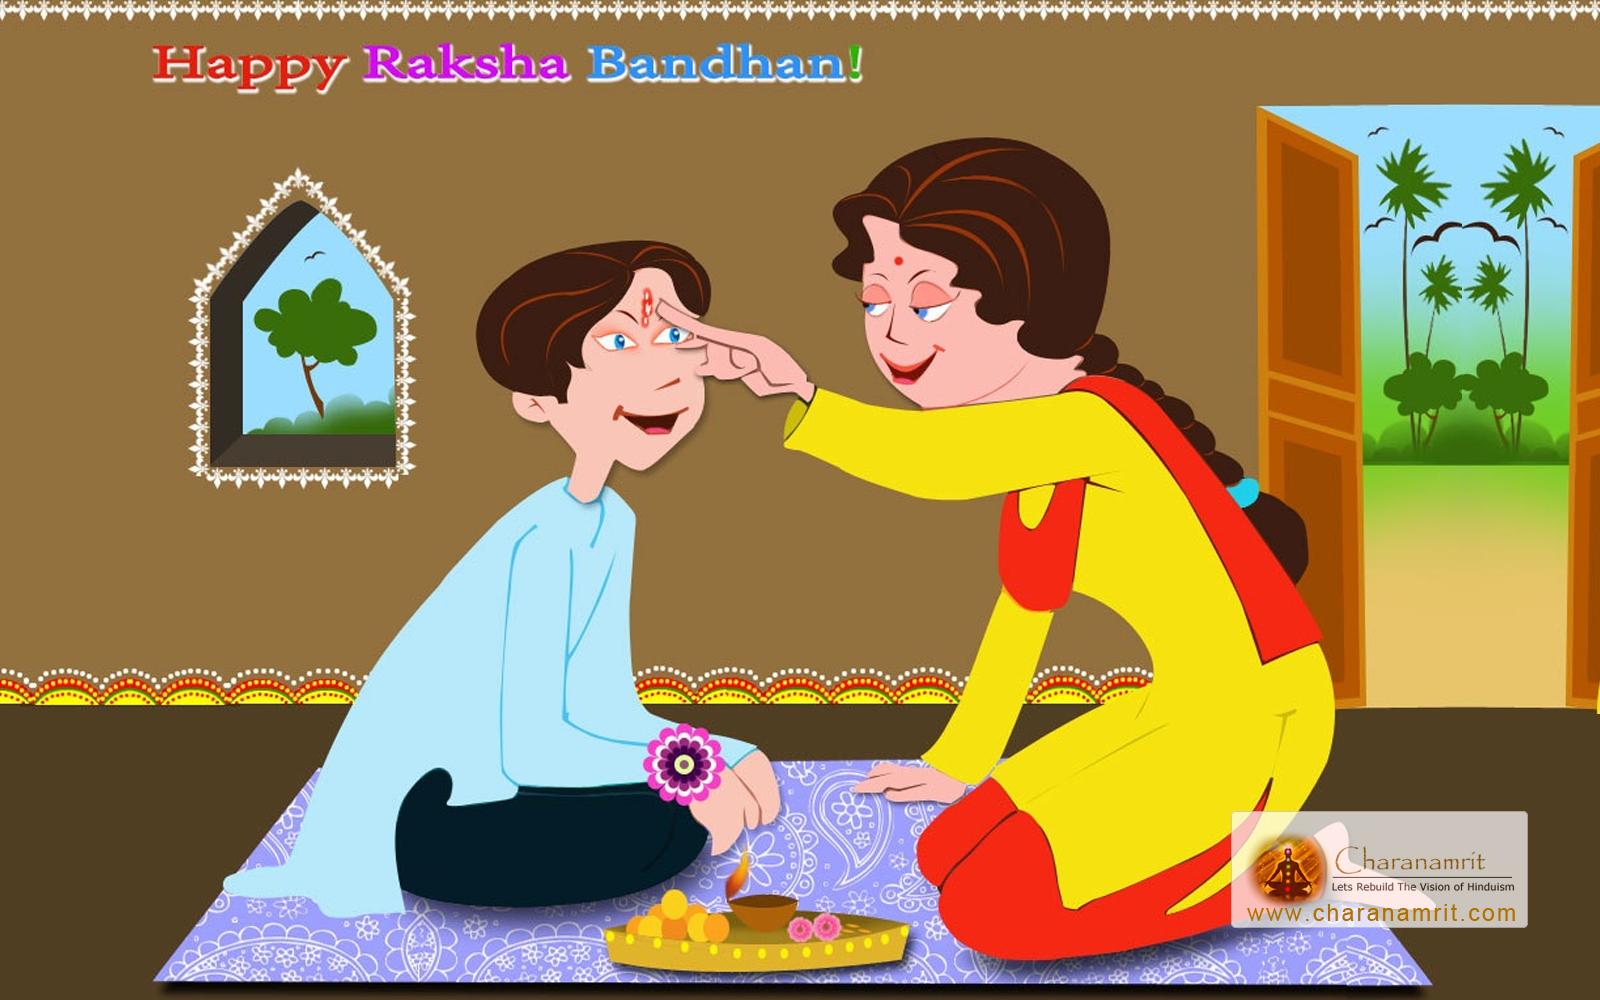 Raksha Bandhan Images Pictures Wallpaper Pics HD